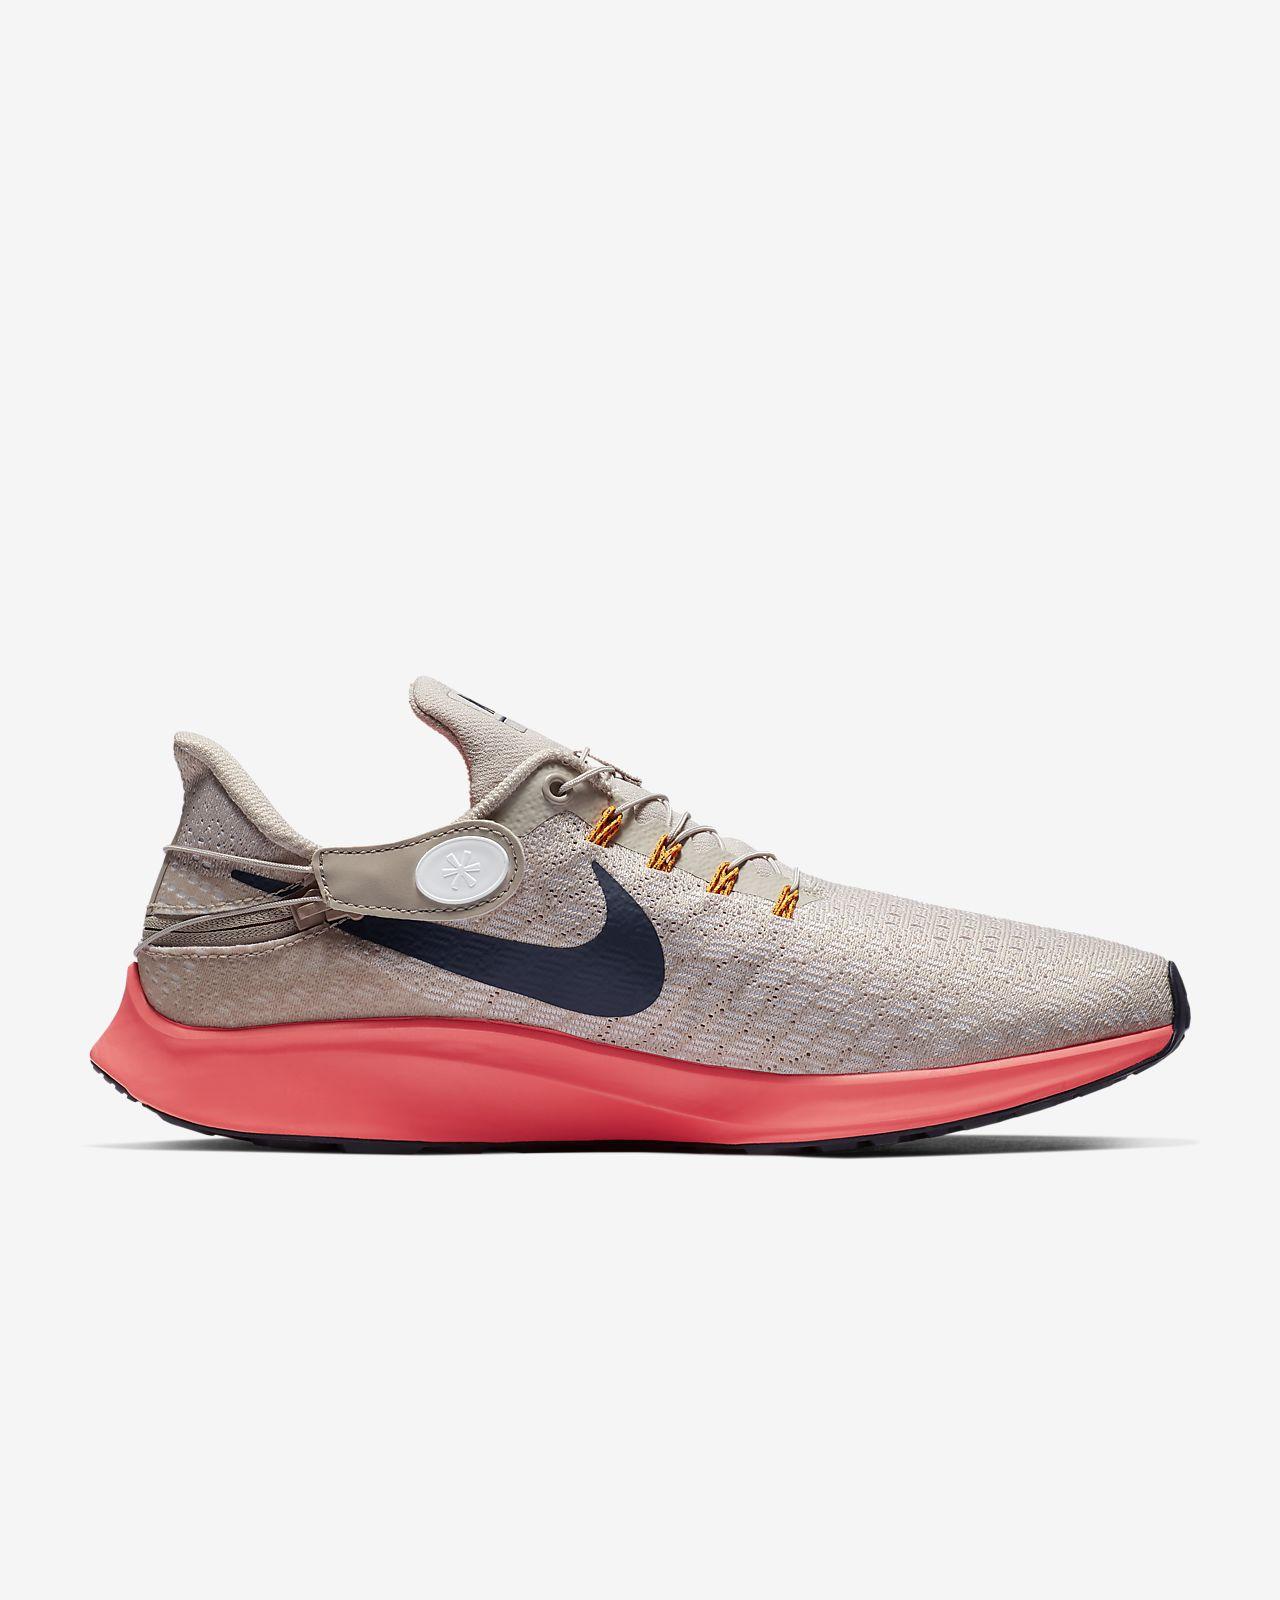 86b5a3b4d7fabd Nike Air Zoom Pegasus 35 FlyEase Men s Running Shoe. Nike.com